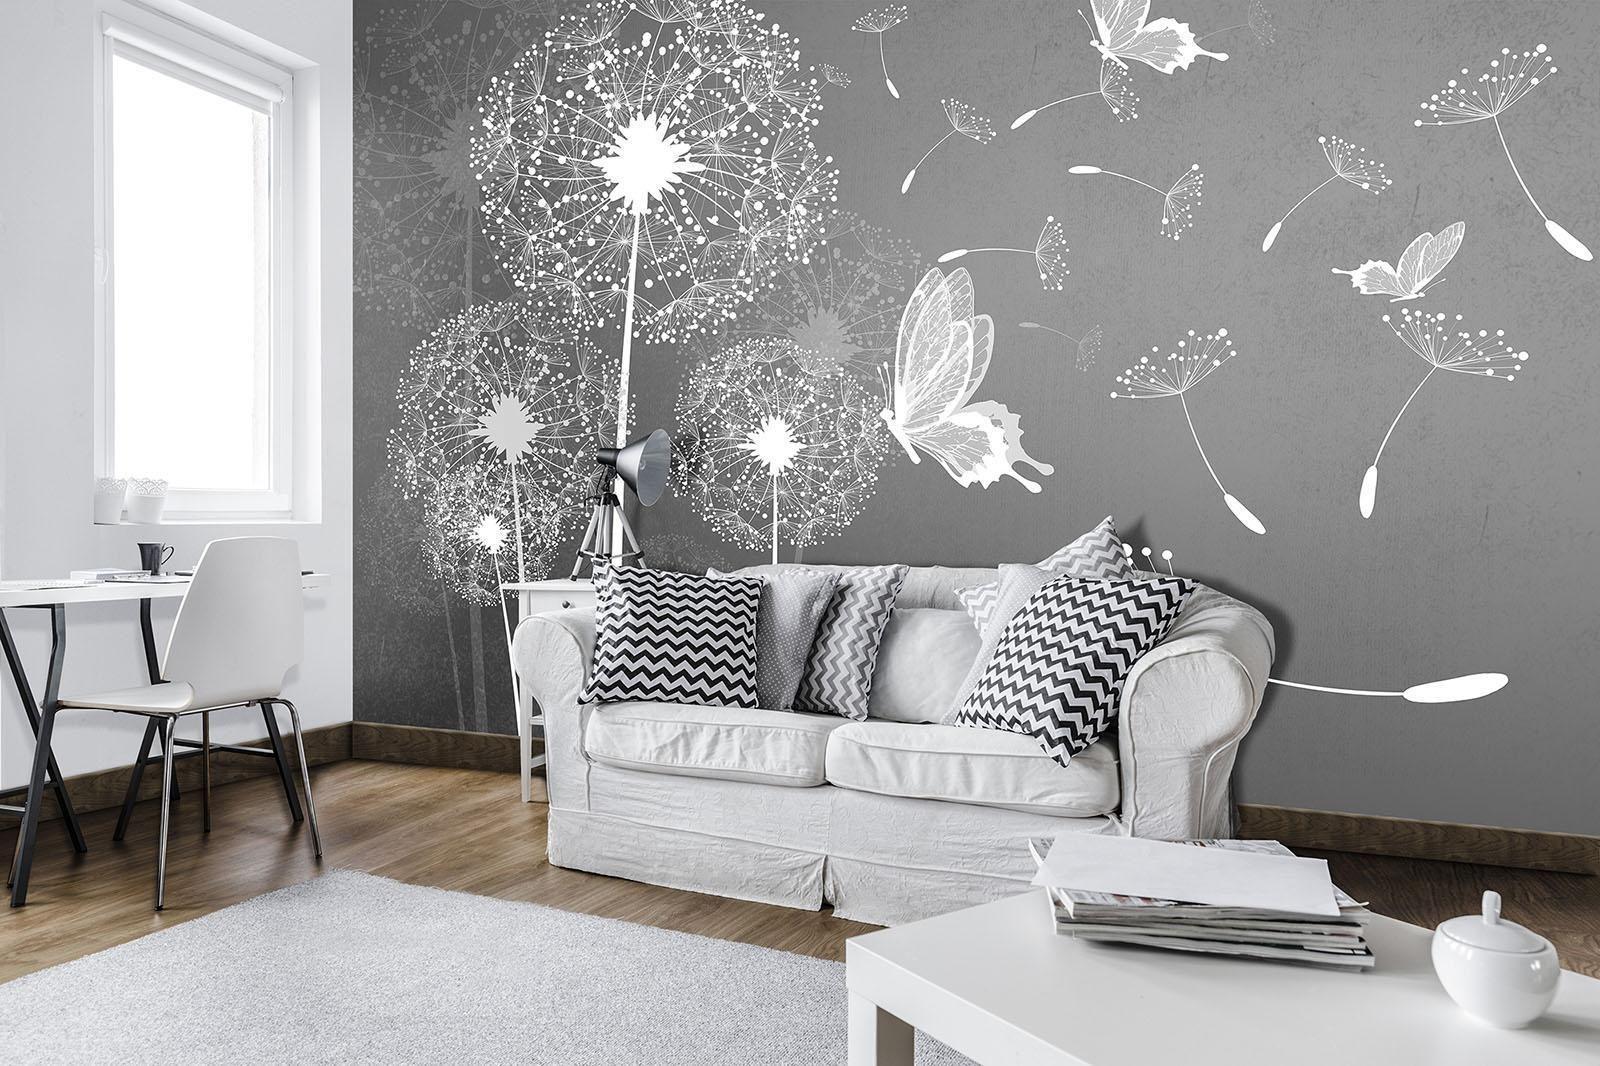 Fx_p  Fototapete Tapete Wandbild Pusteblumen Und Schmetterlinge Natur